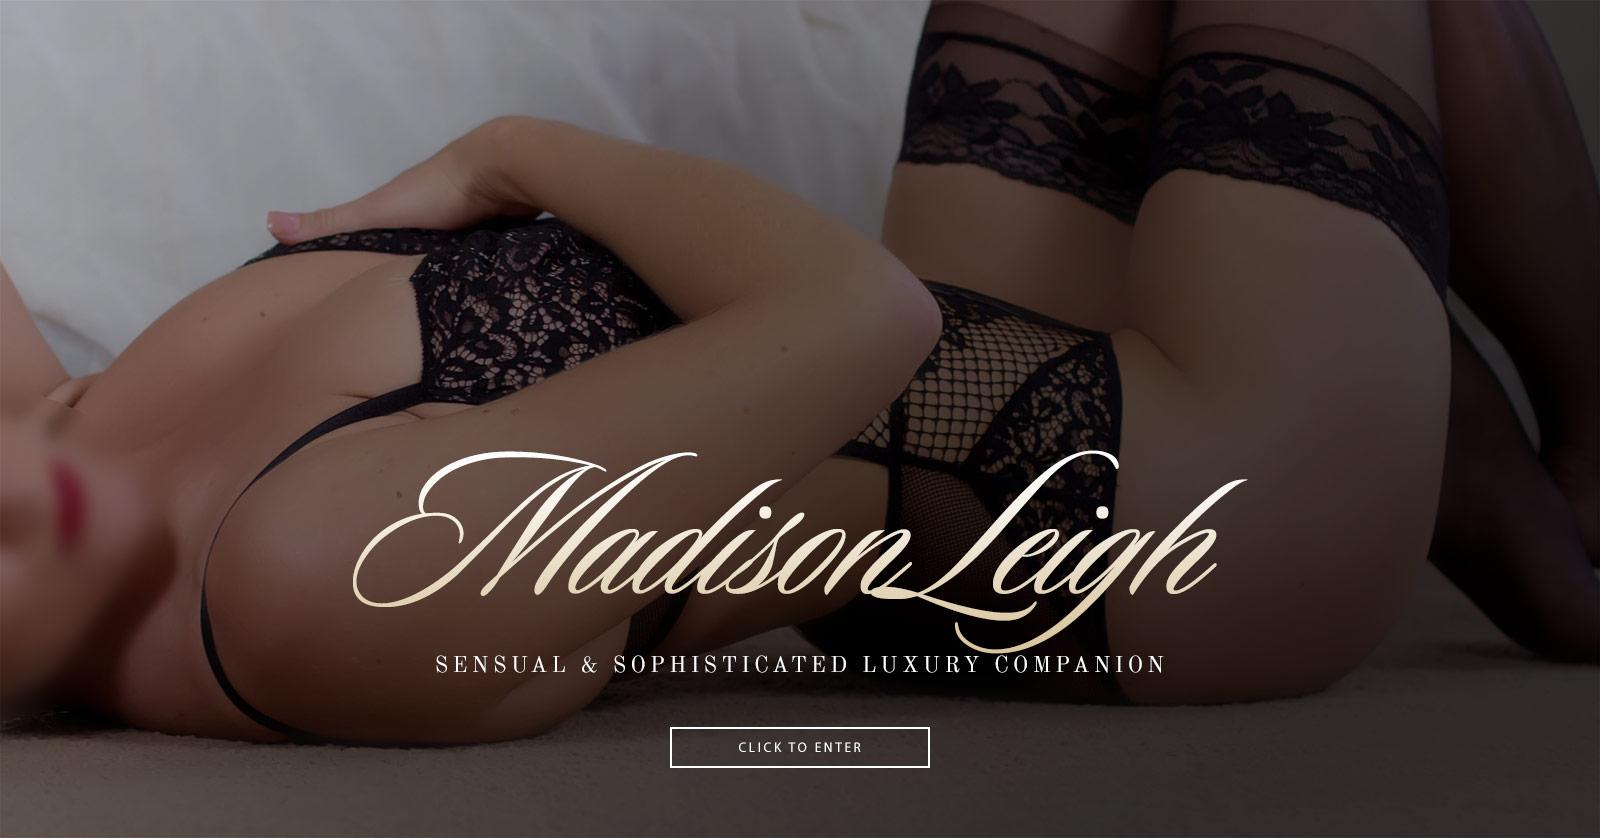 Madison Leigh Luxury Escort